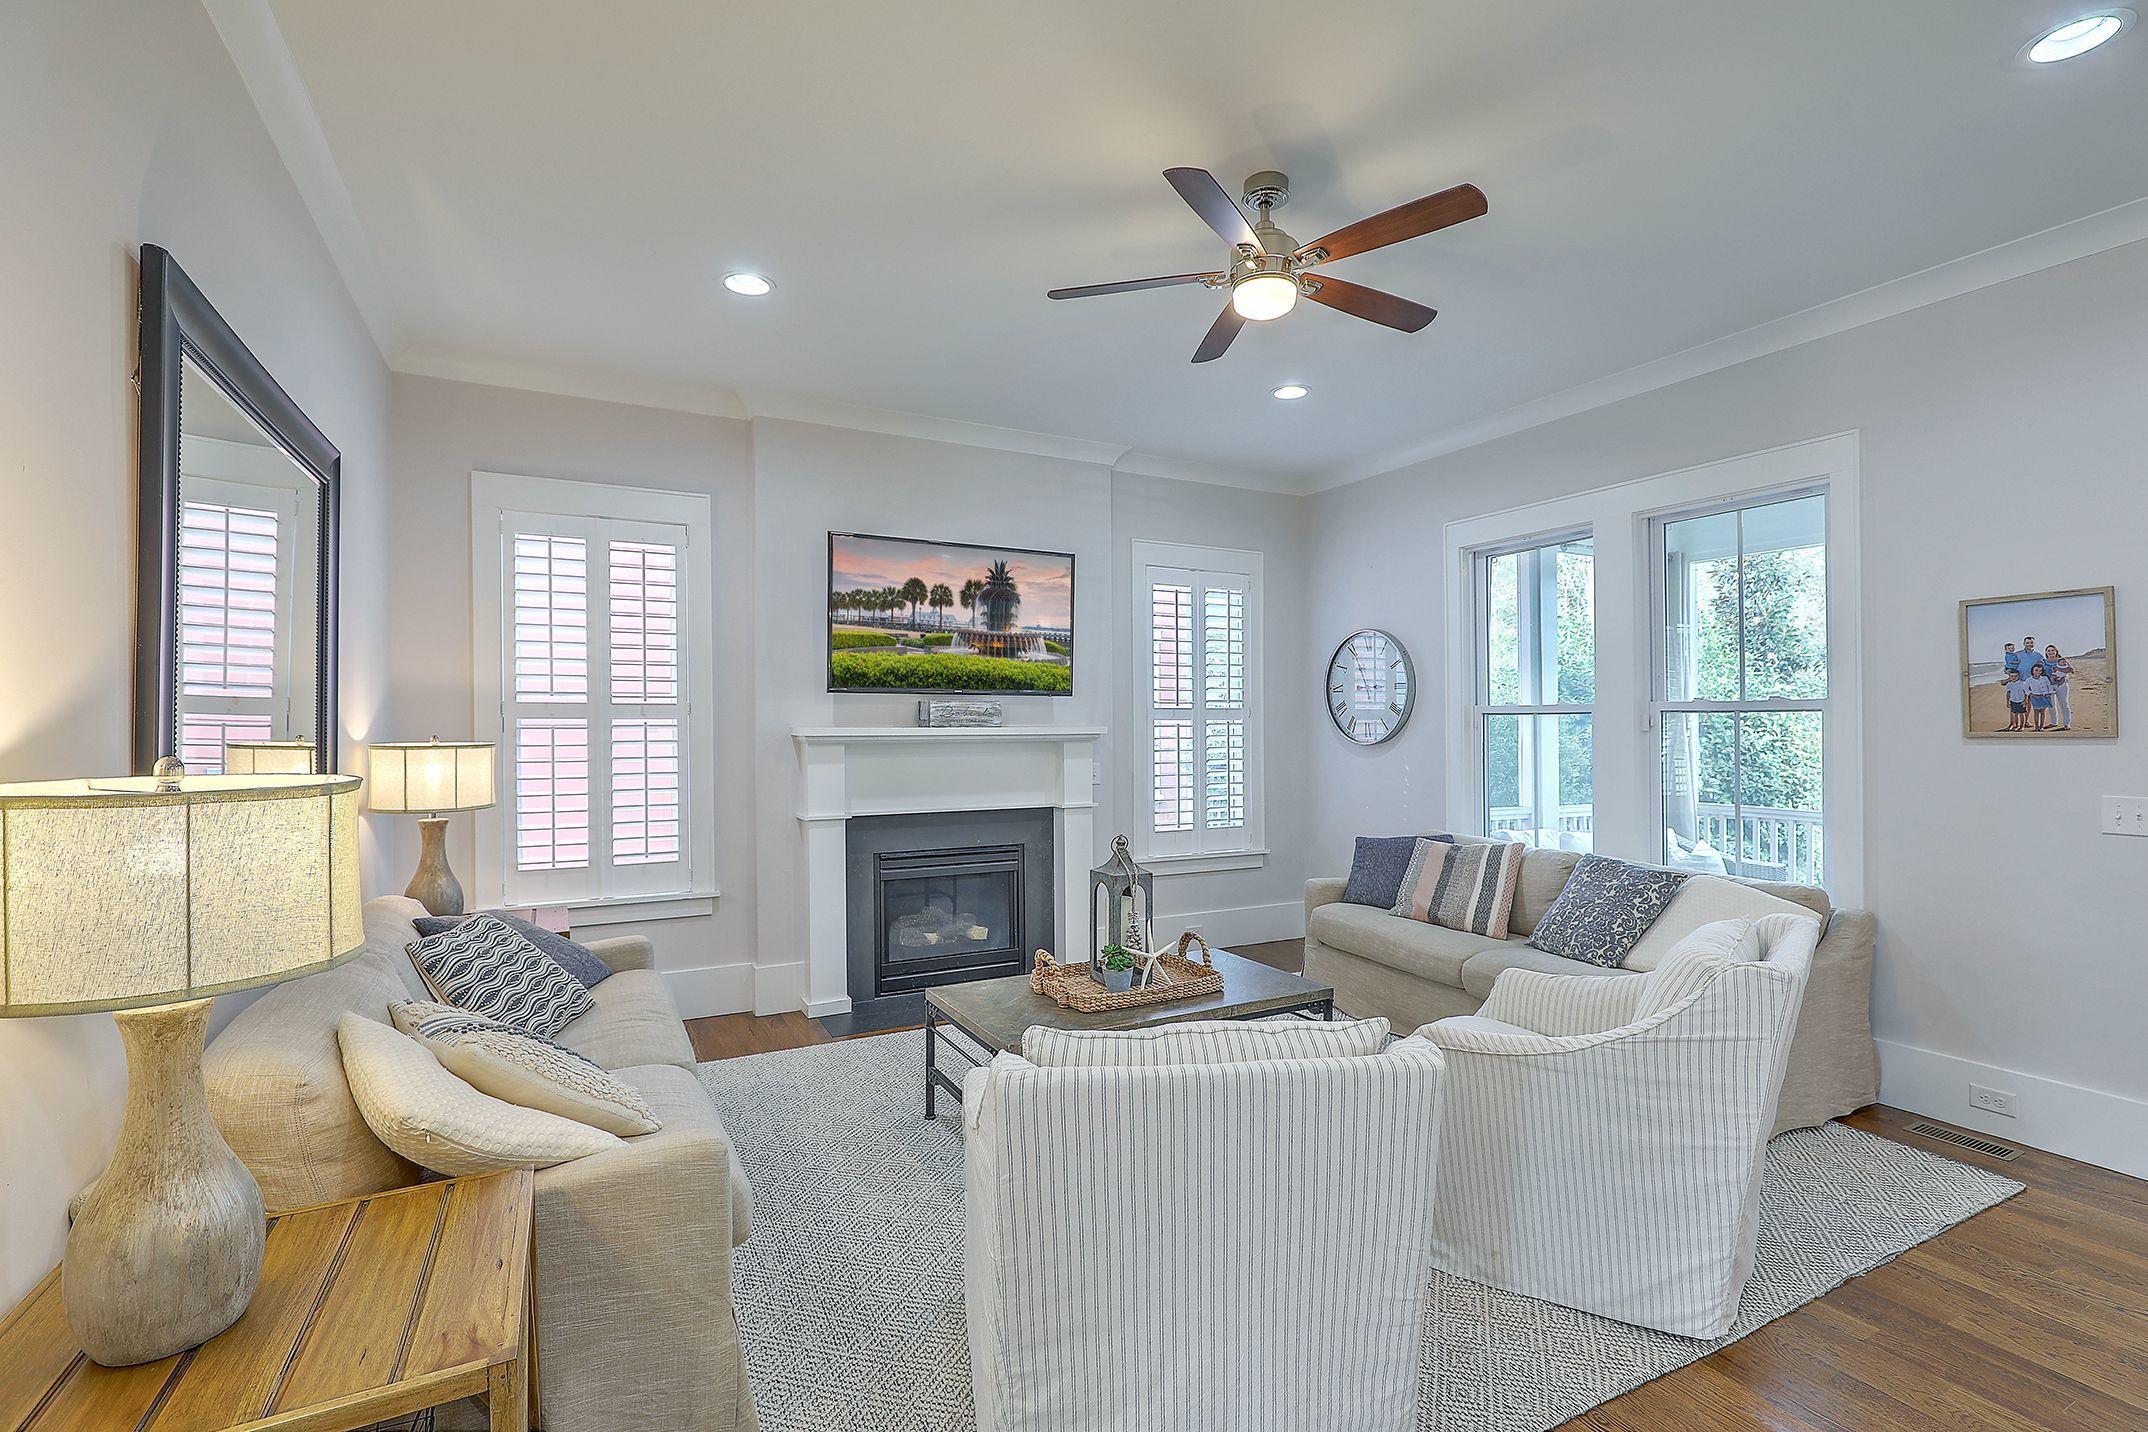 Carolina Park Homes For Sale - 1466 Gunnison, Mount Pleasant, SC - 10